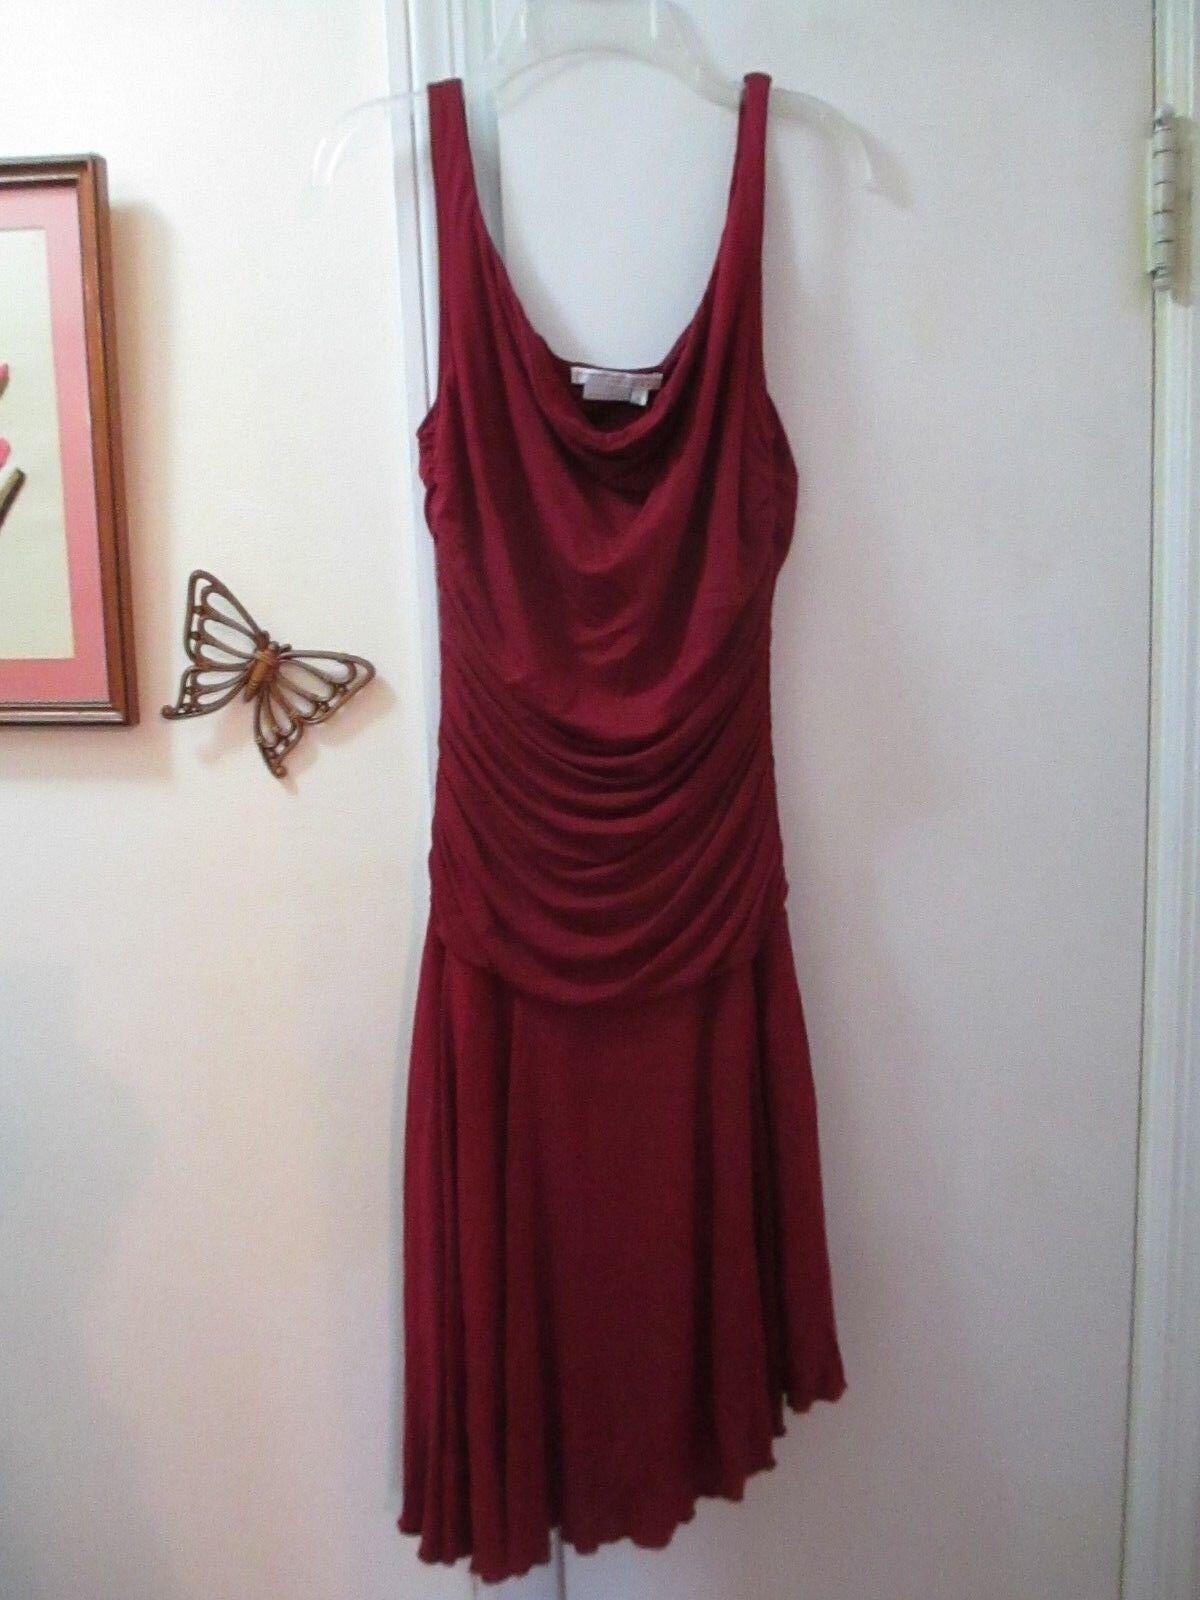 Burgundy Sleeveless Scrunched Asymmetrical Hem Knit Dress - Size M -  New w Tag